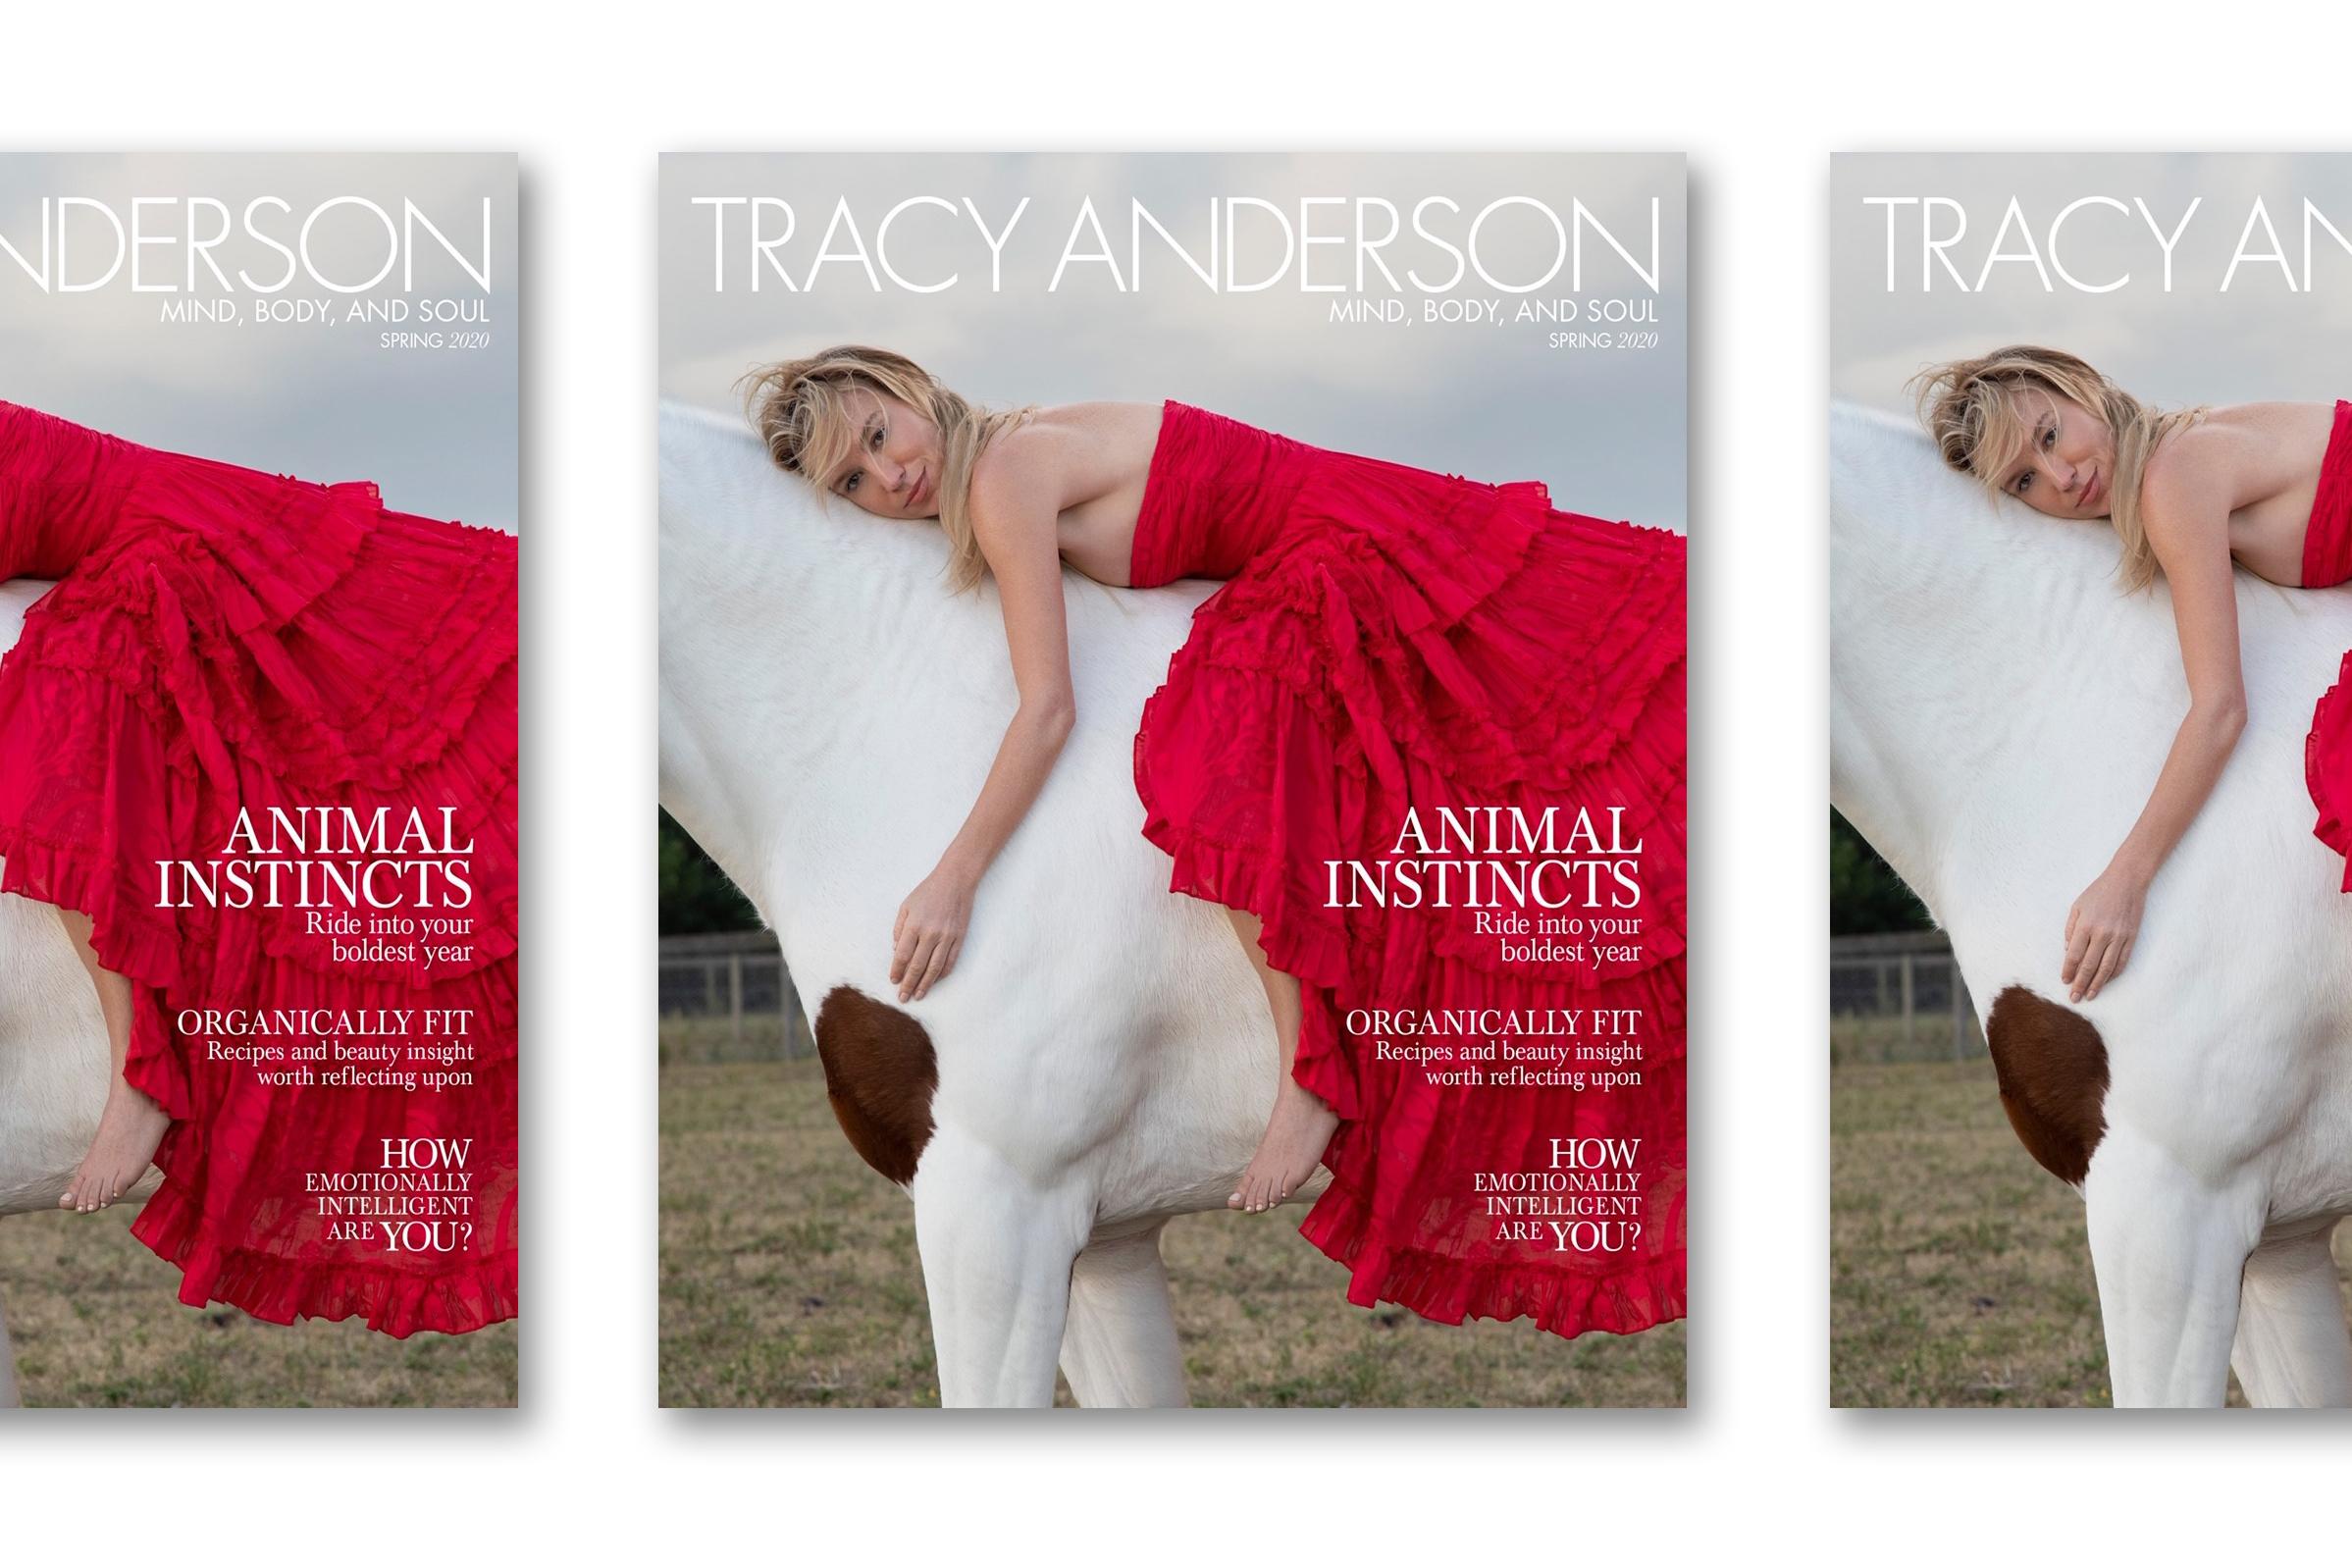 Tracy Anderson's new magazine